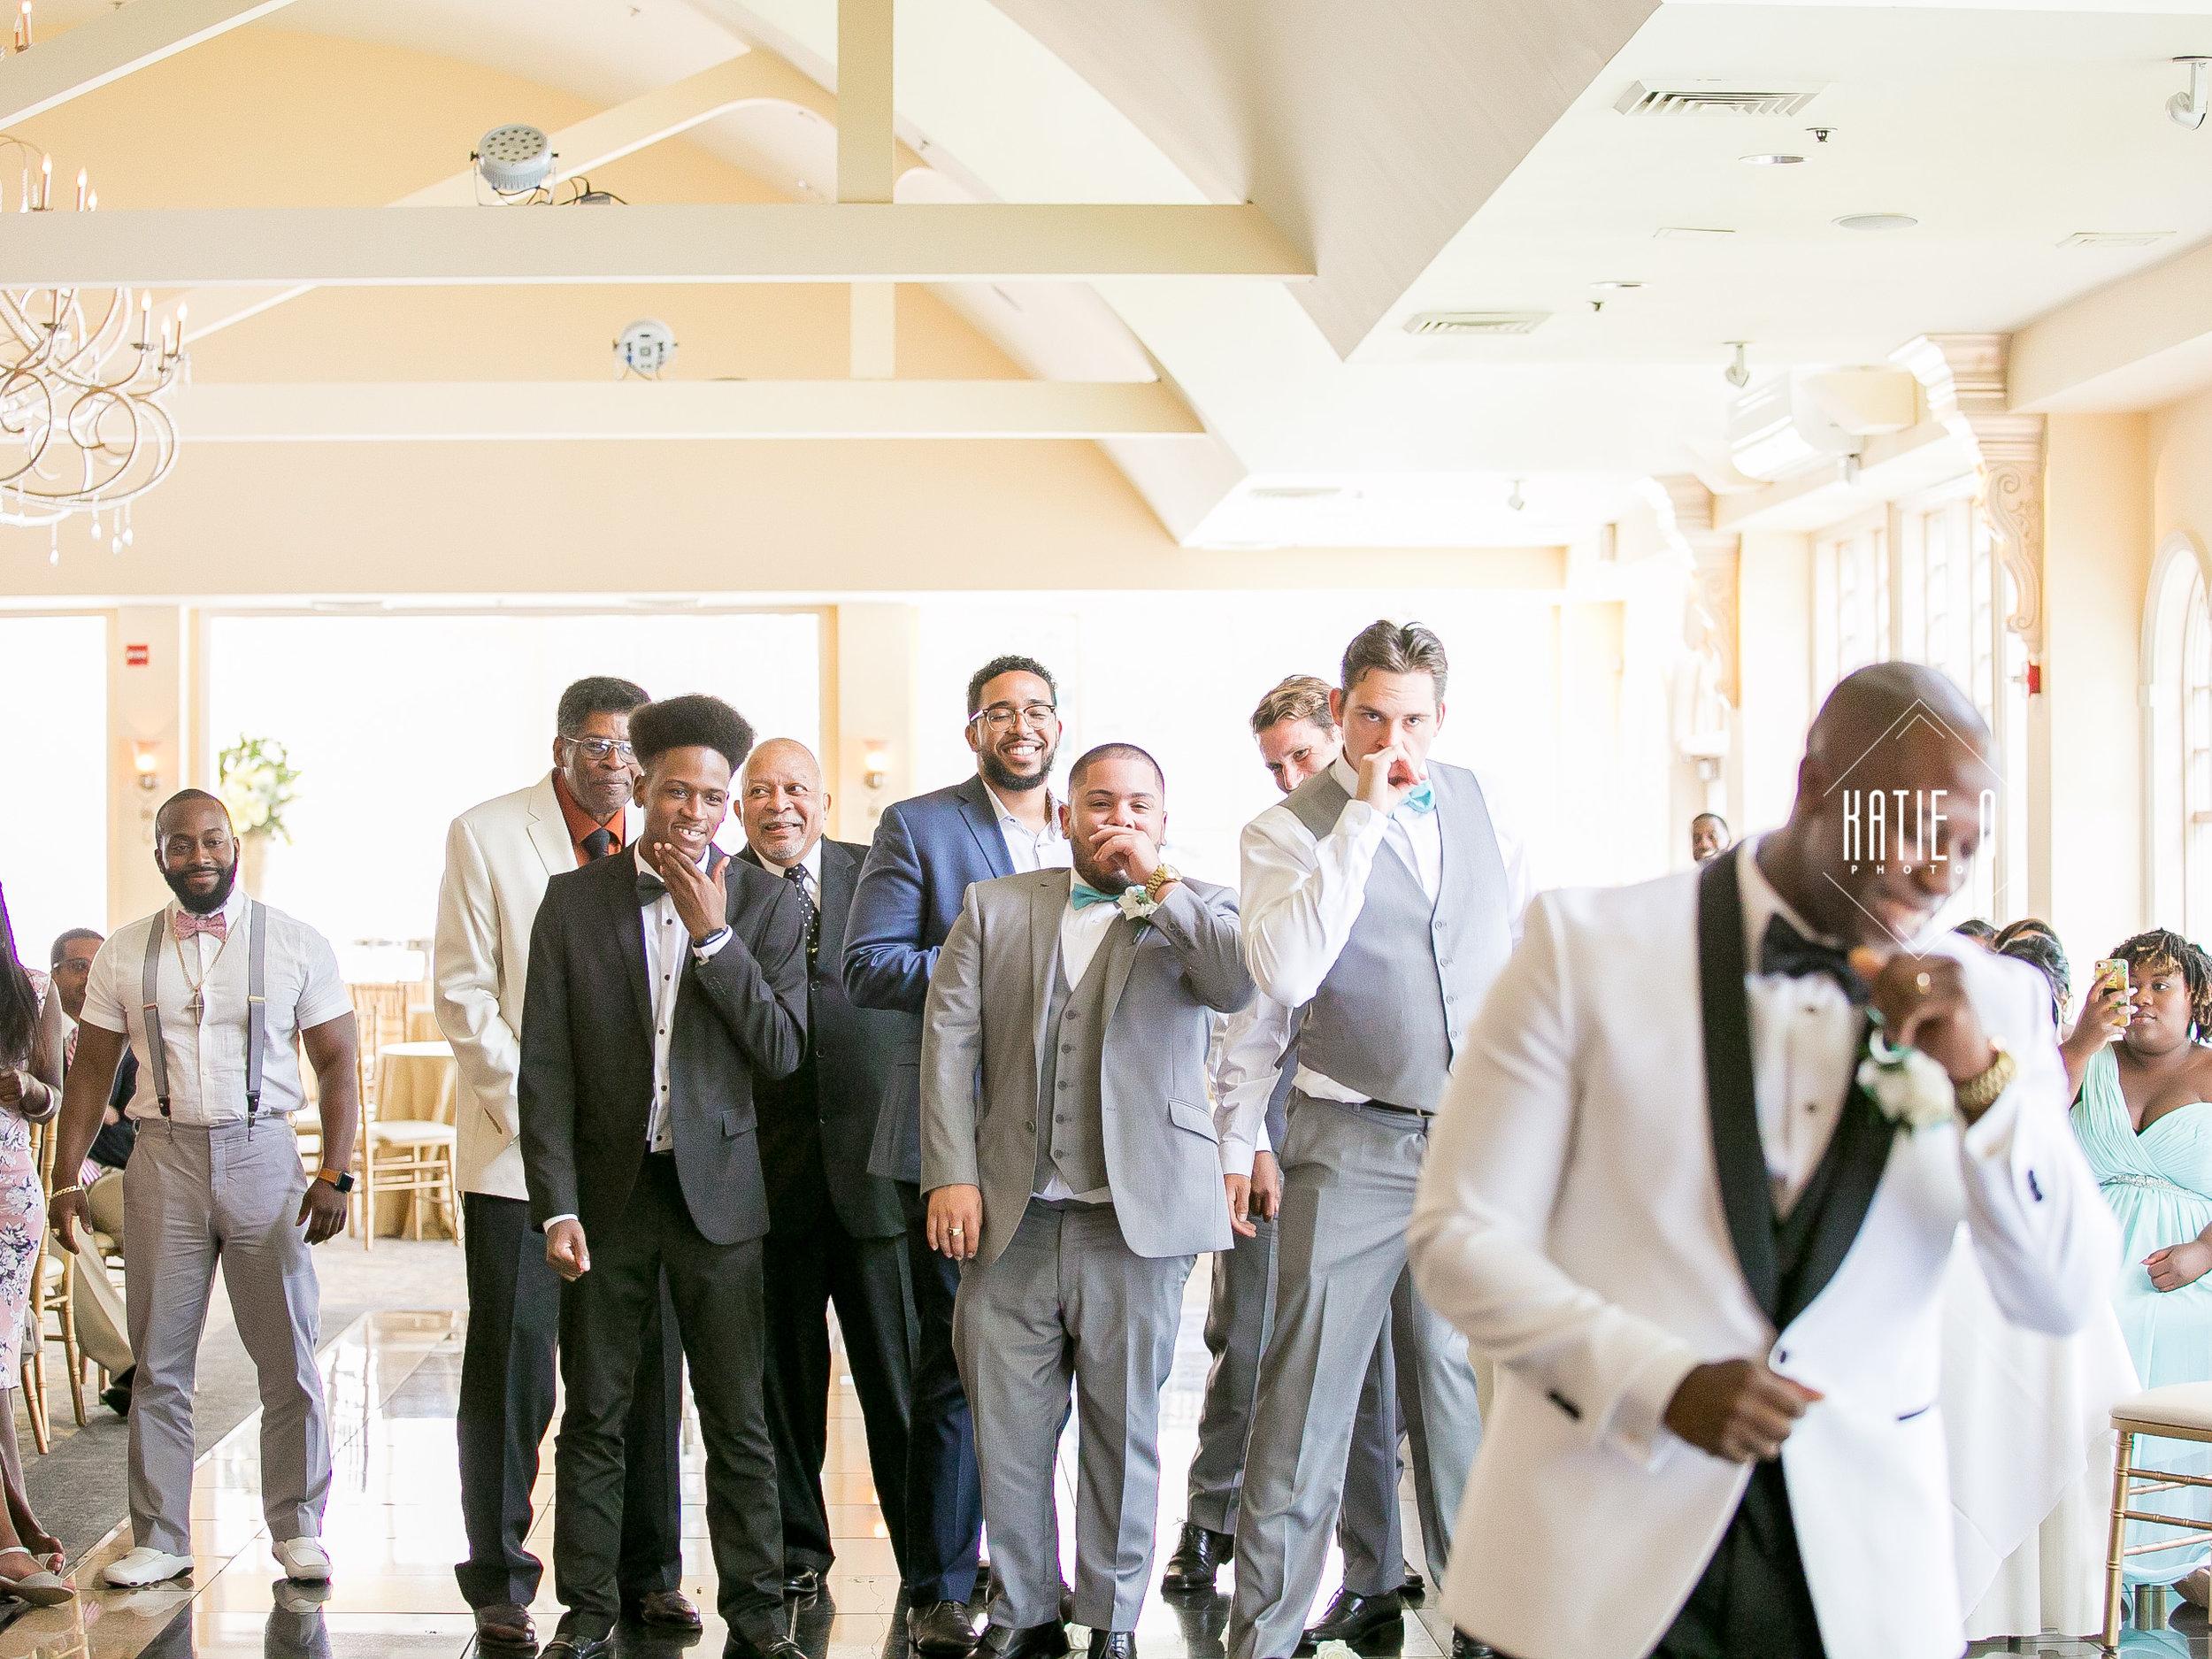 CT-WEDDING-PHOTOGRAPHER-BLOG-69.jpg